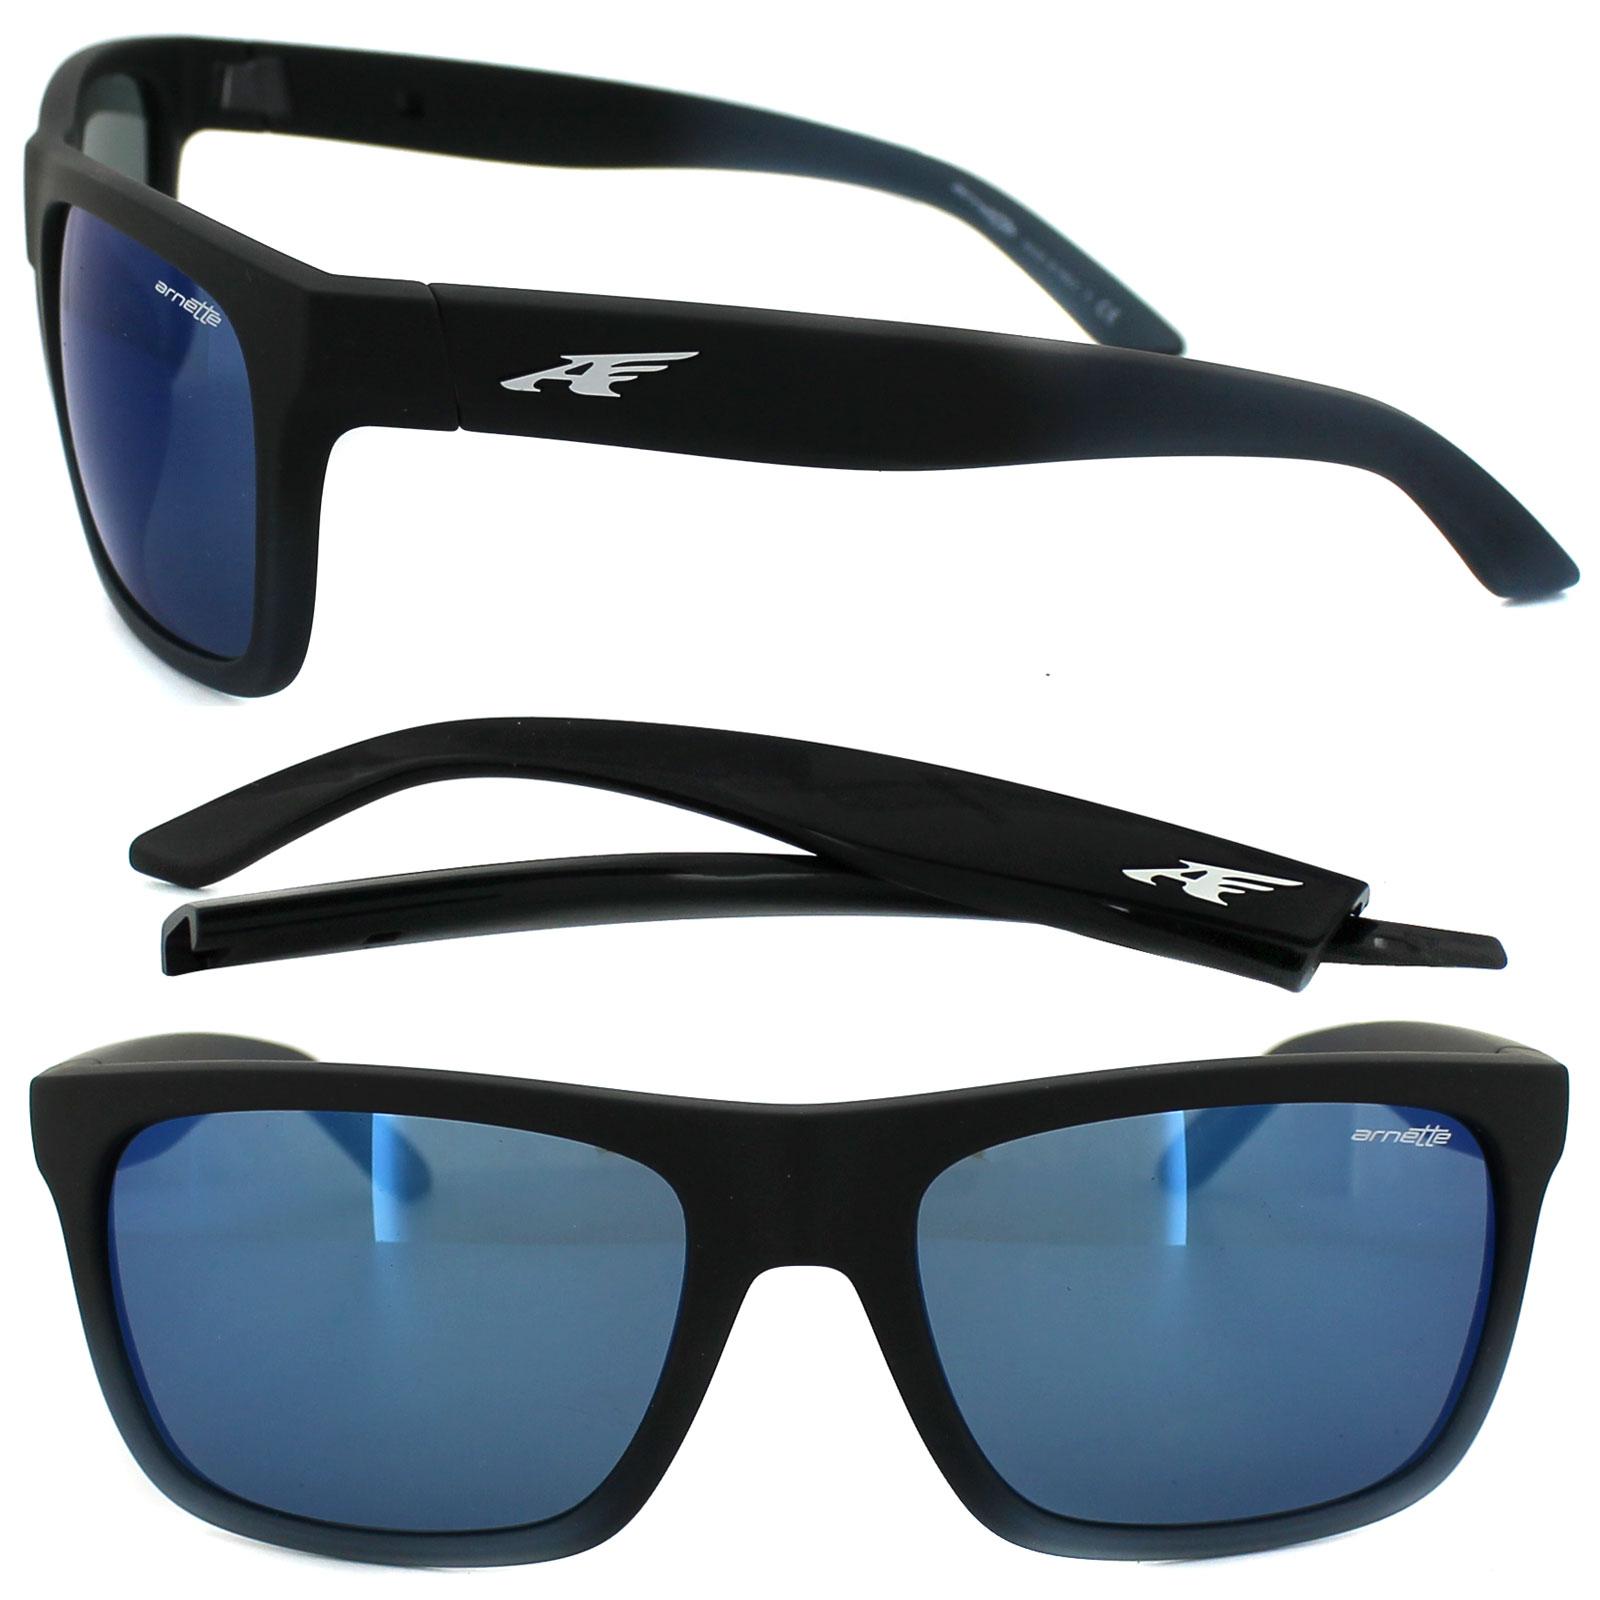 57f30f4391 Arnette Sunglasses 4176 Dropout Thumbnail 1 Arnette Sunglasses 4176 Dropout  Thumbnail 2 ...